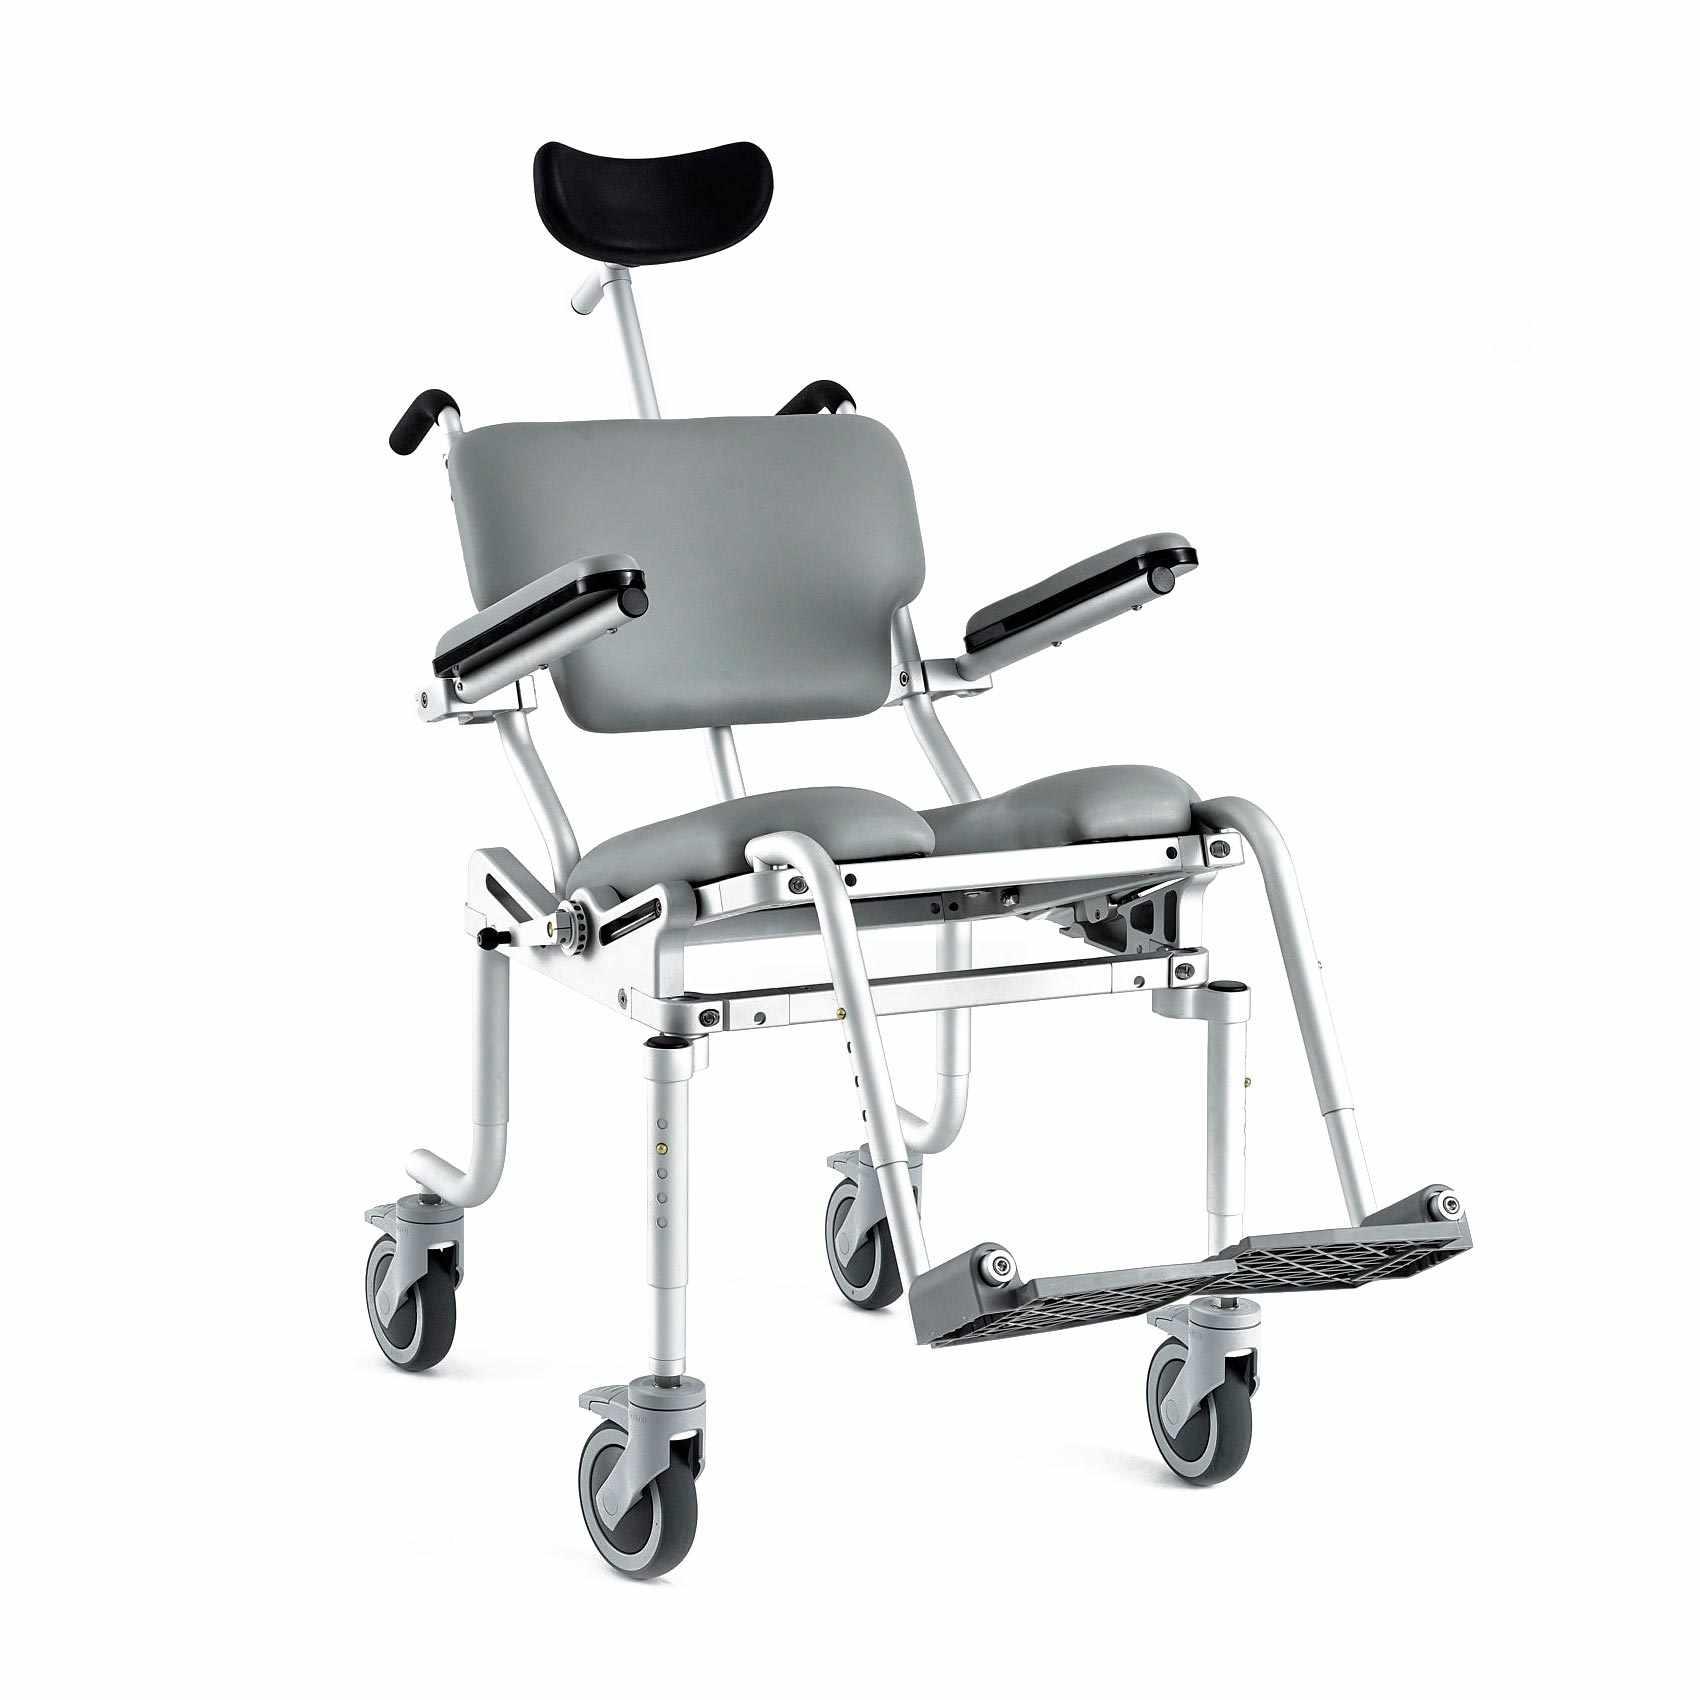 Nuprodx Multichair 4000tilt Roll In Shower Commode Chair